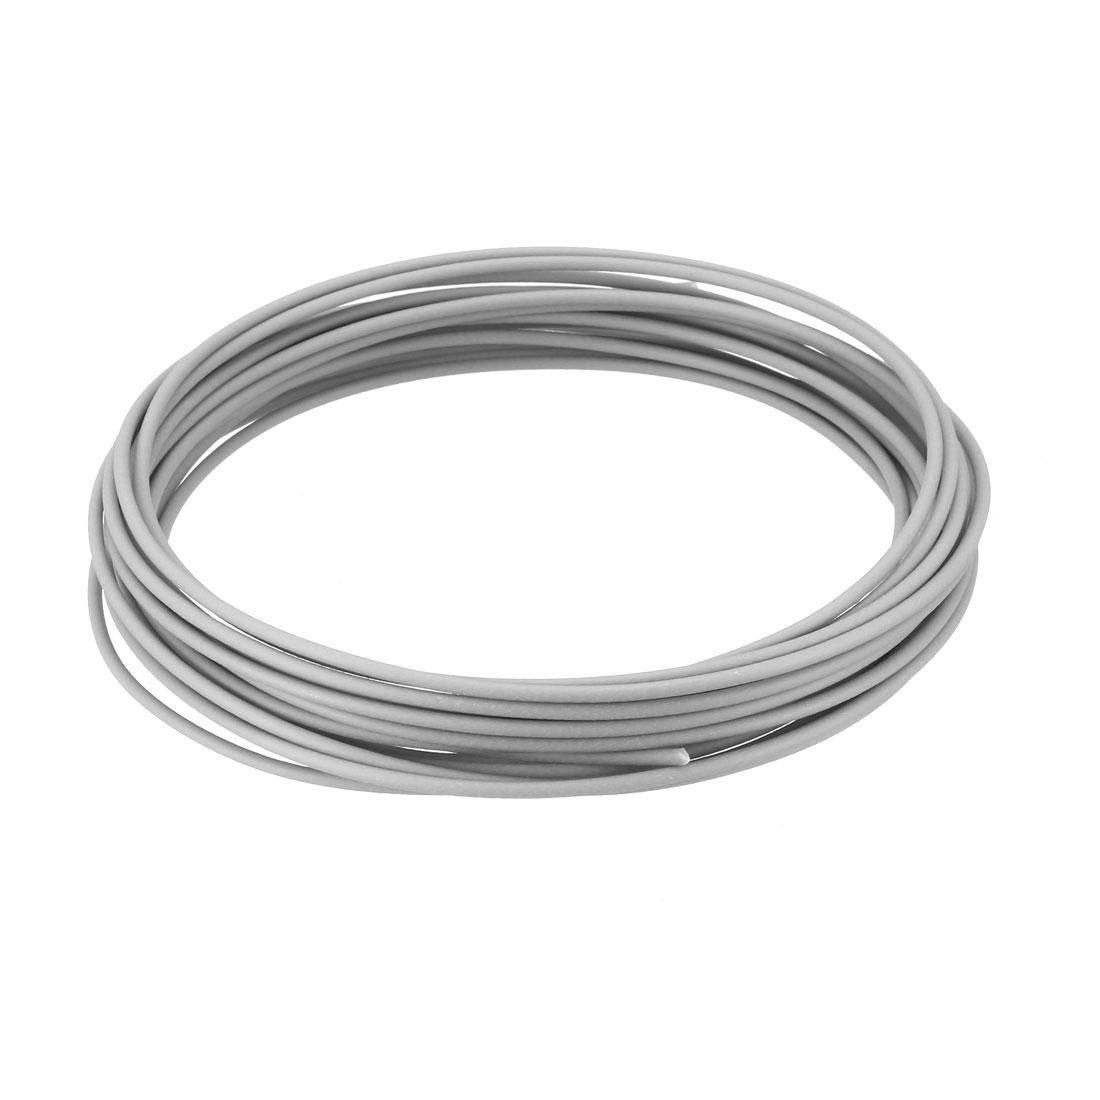 5 Meter/16 Ft PCL 3D Pen/3D Printer Filament, 1.75 mm Silver